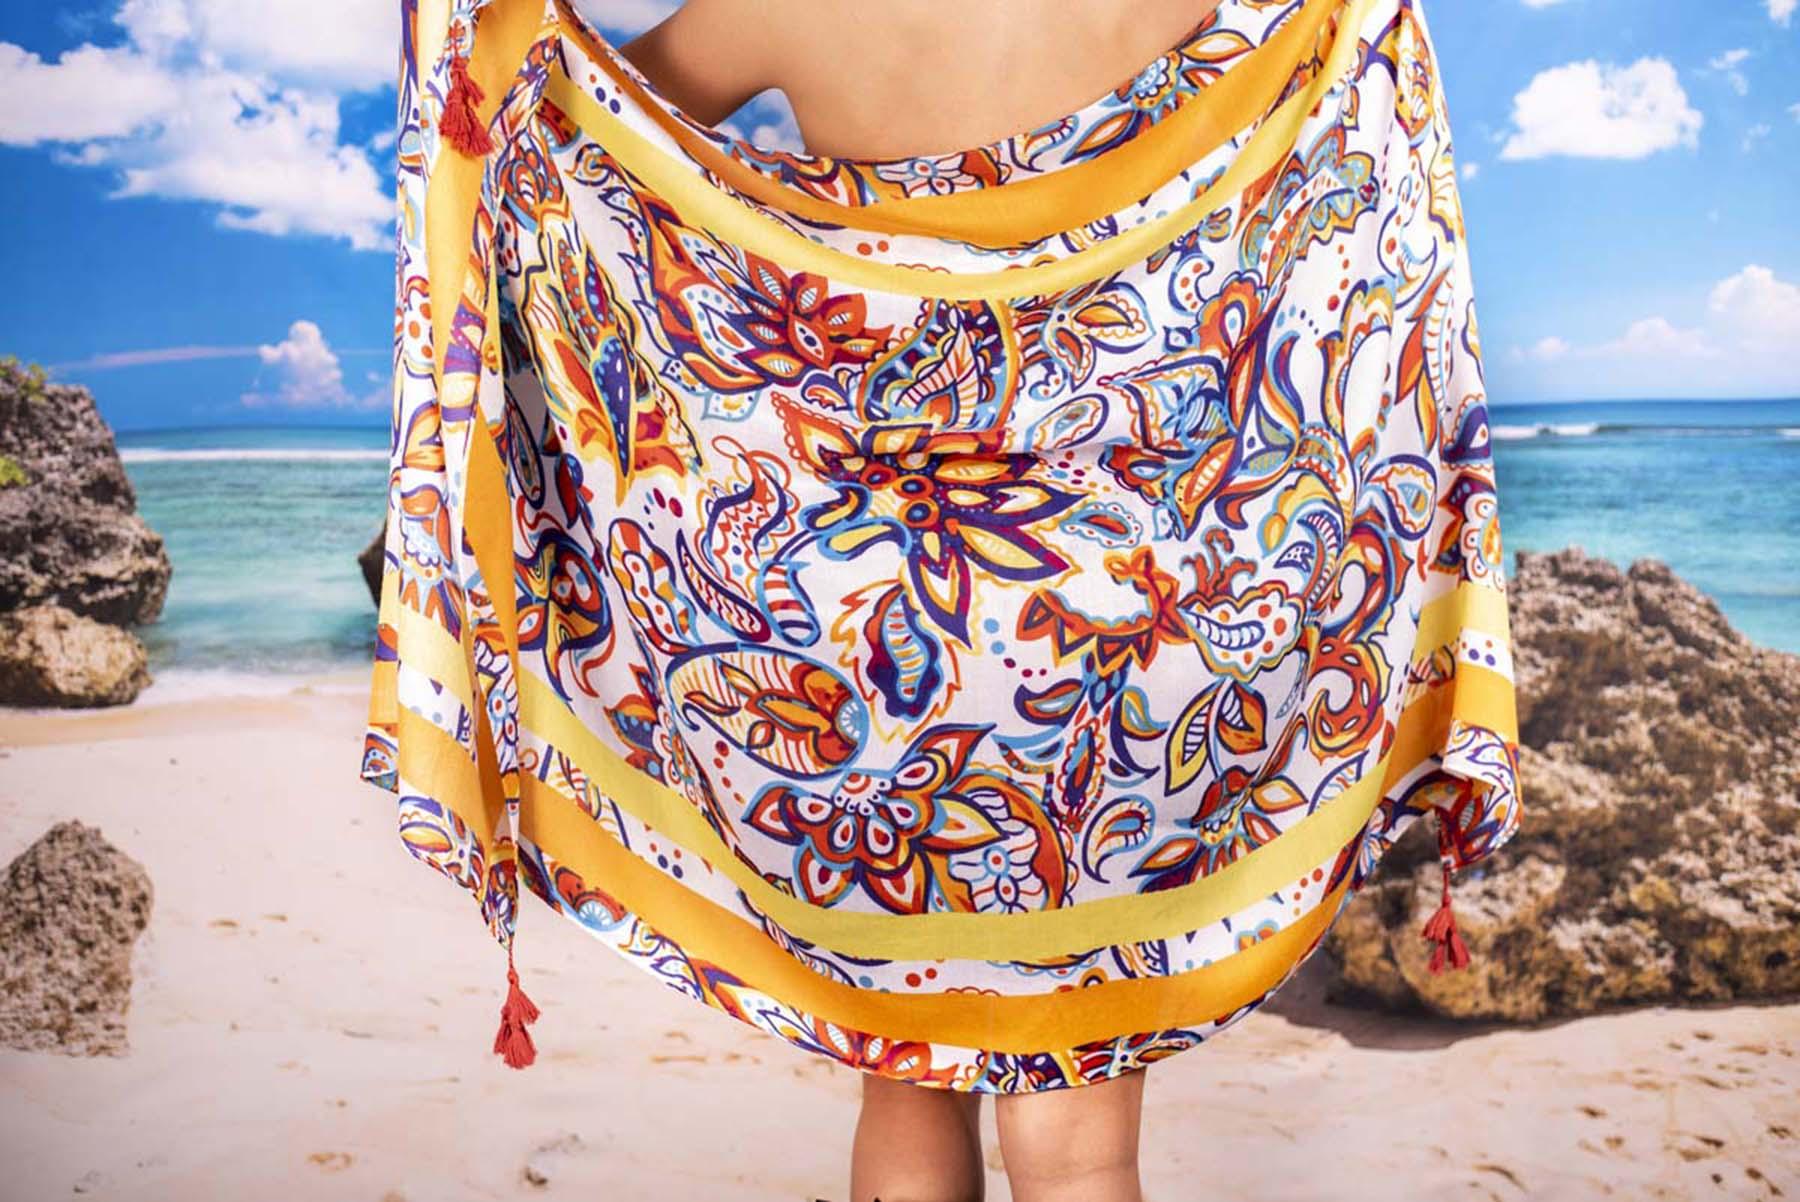 Плажно Парео в Свежи Цветове